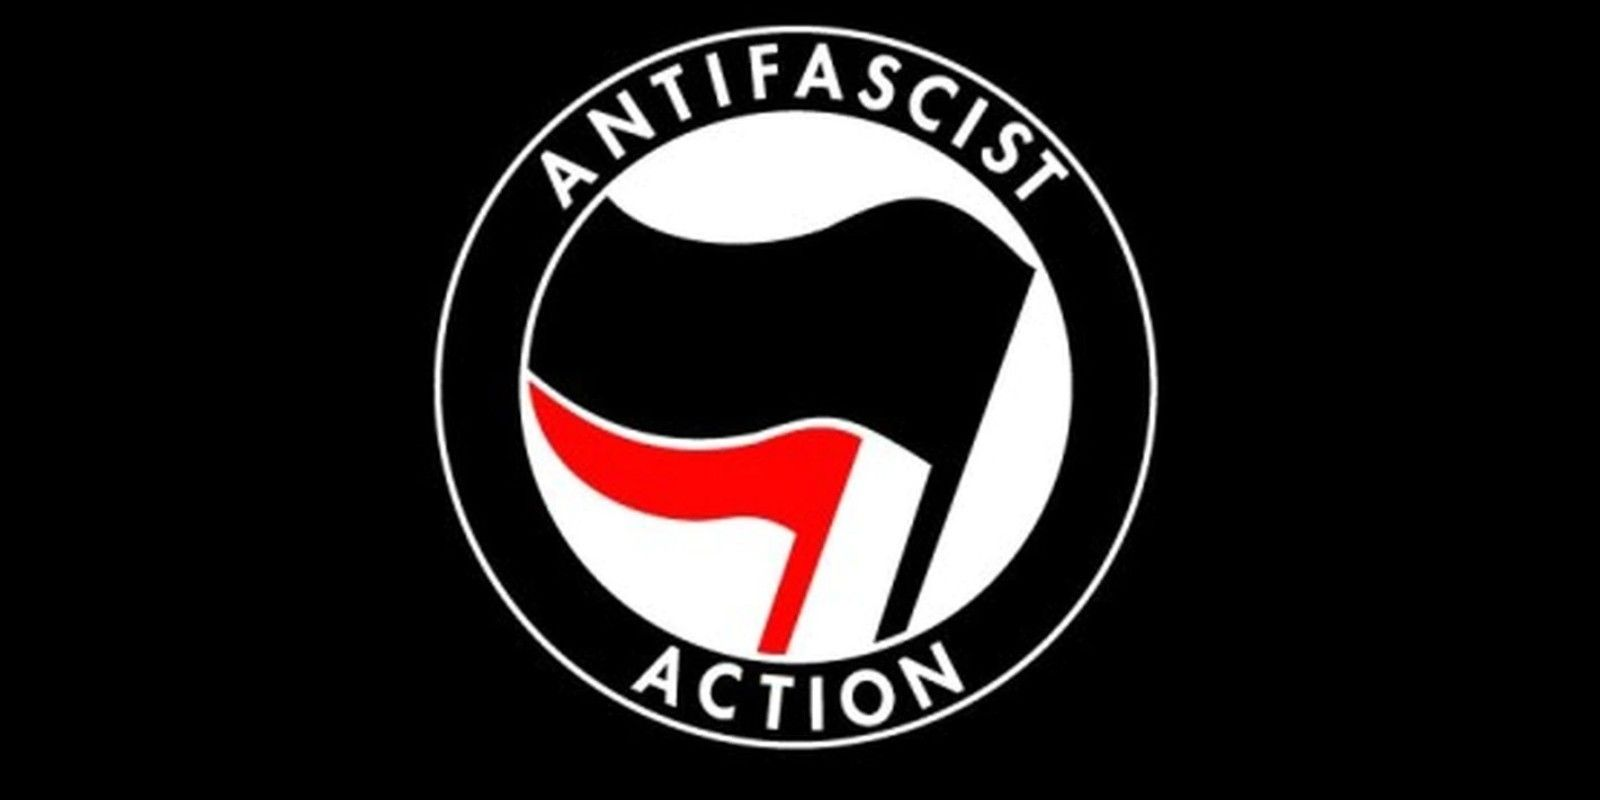 Twitter Suspends Suspicious Self-Described Antifa Account for Threats of  Violence